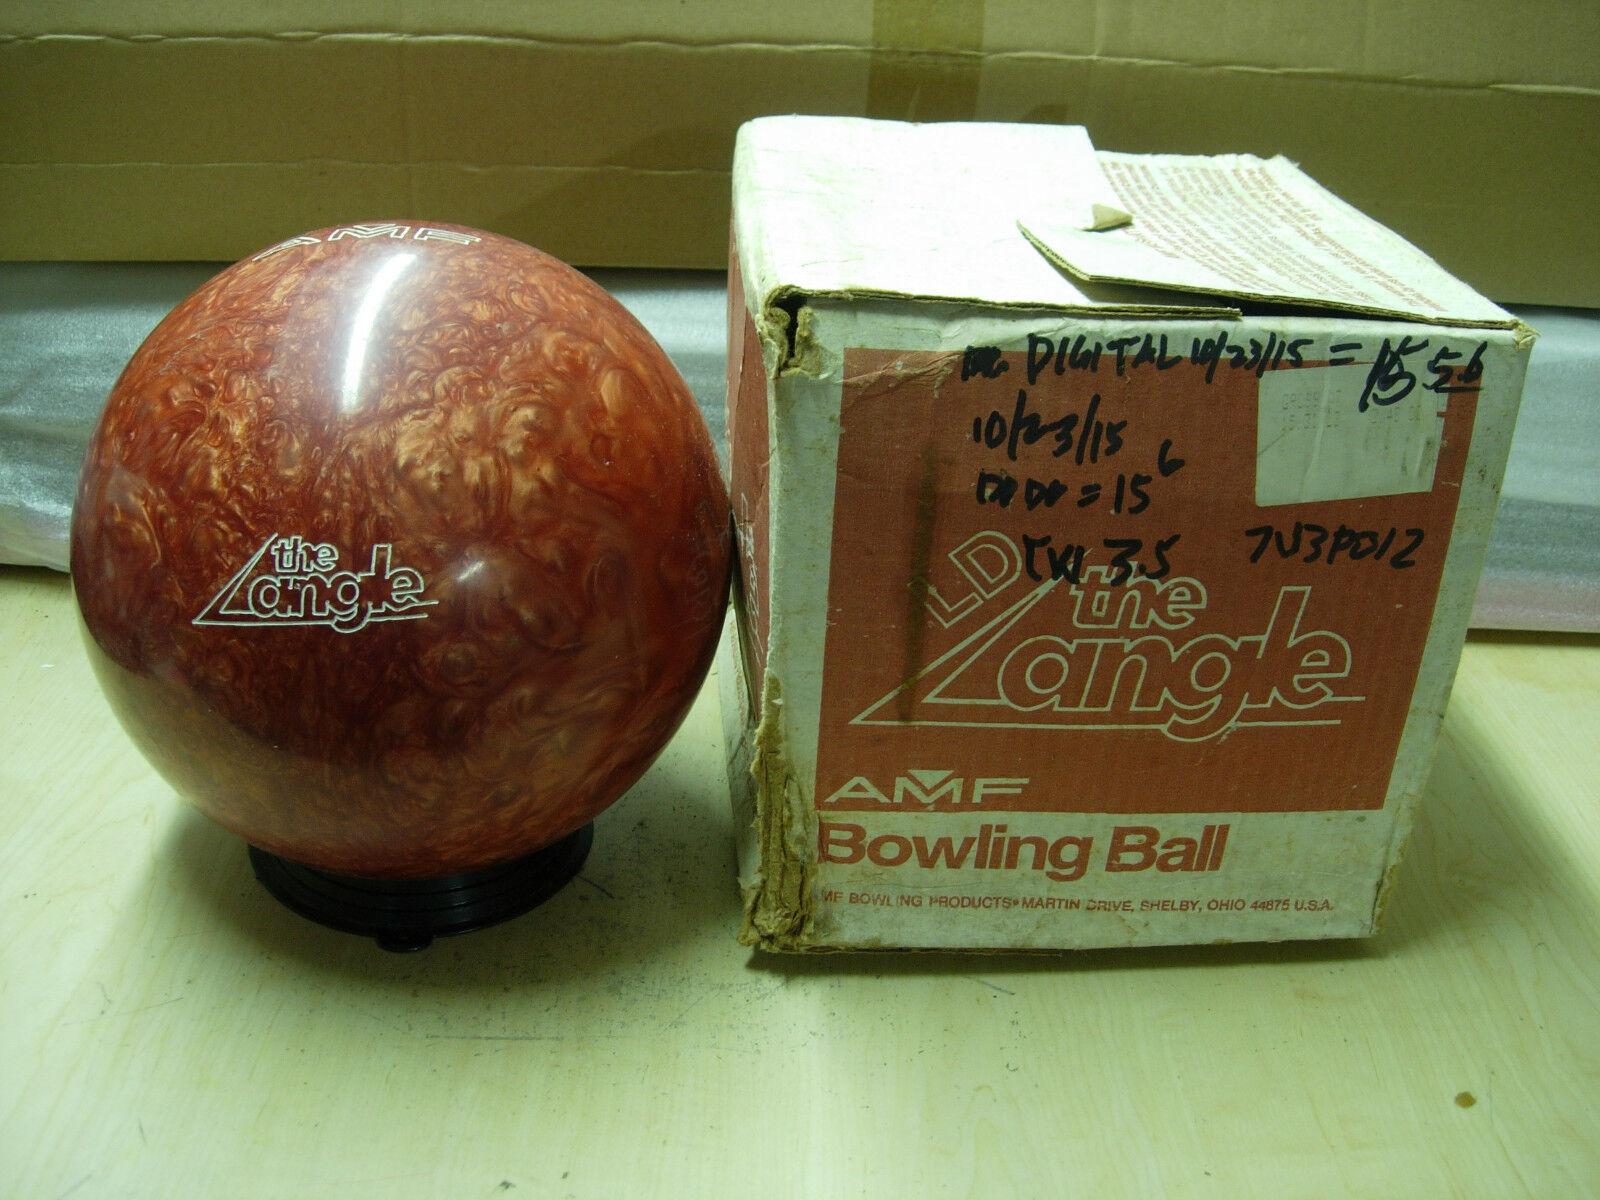 15oz TW 3.5 AMF 1987 Angle LD (Limited Distance) orange Swirl Urethane Ball